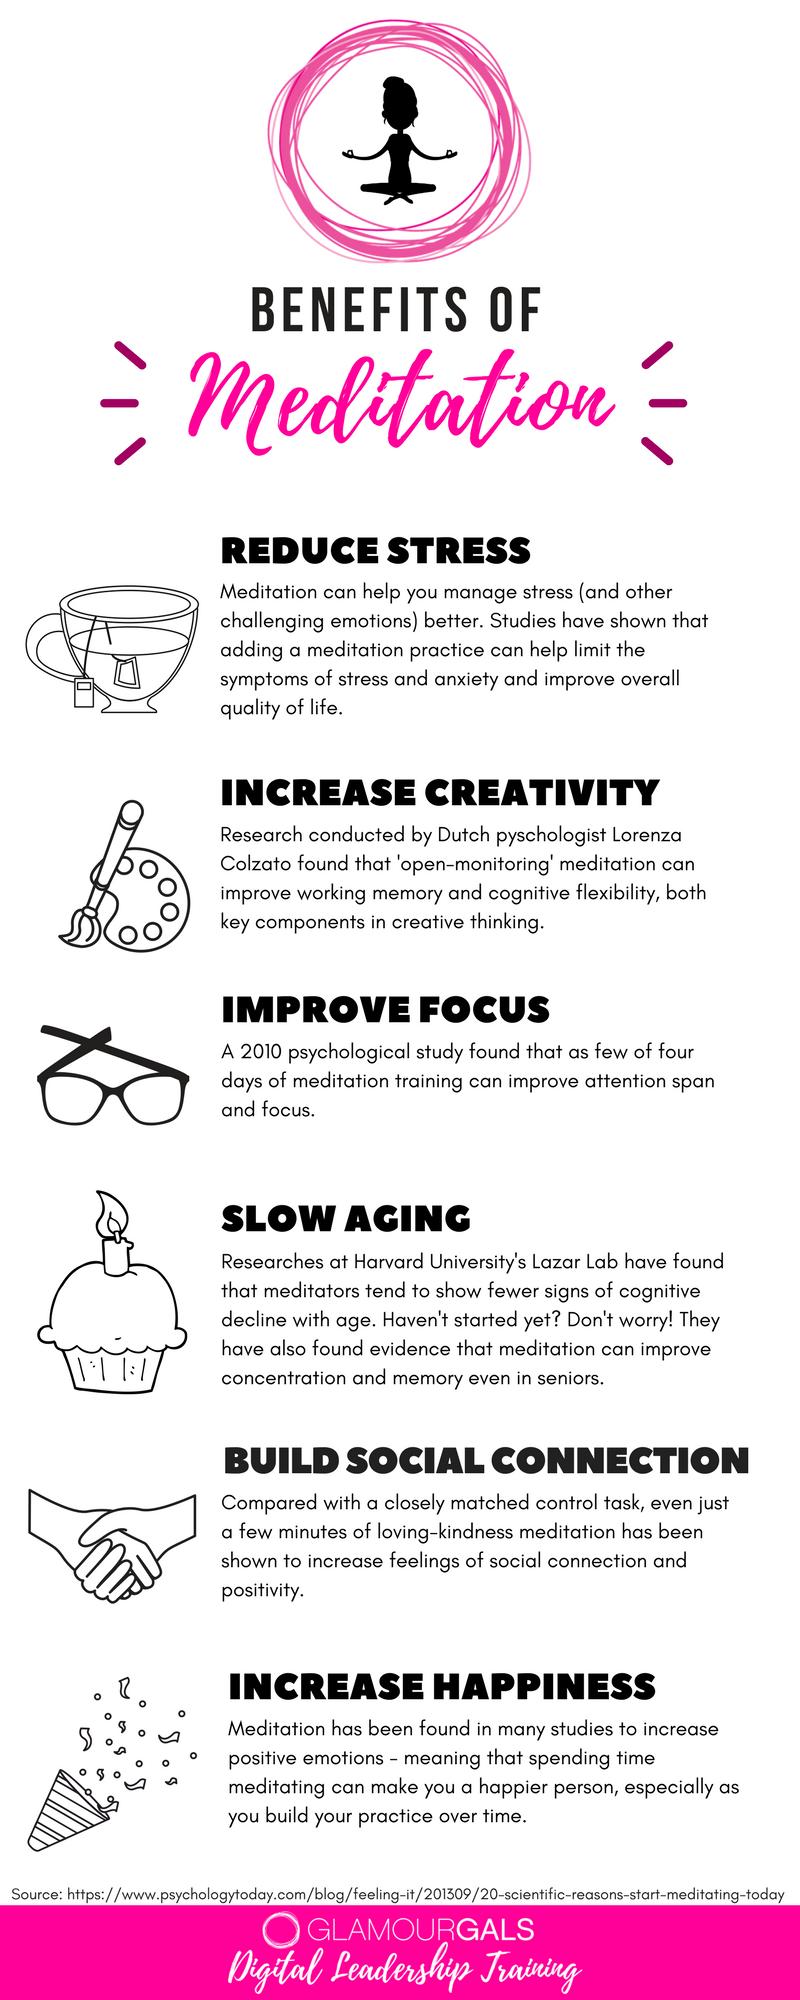 Reasons to Meditate - GlamourGals Digital Leadership Training